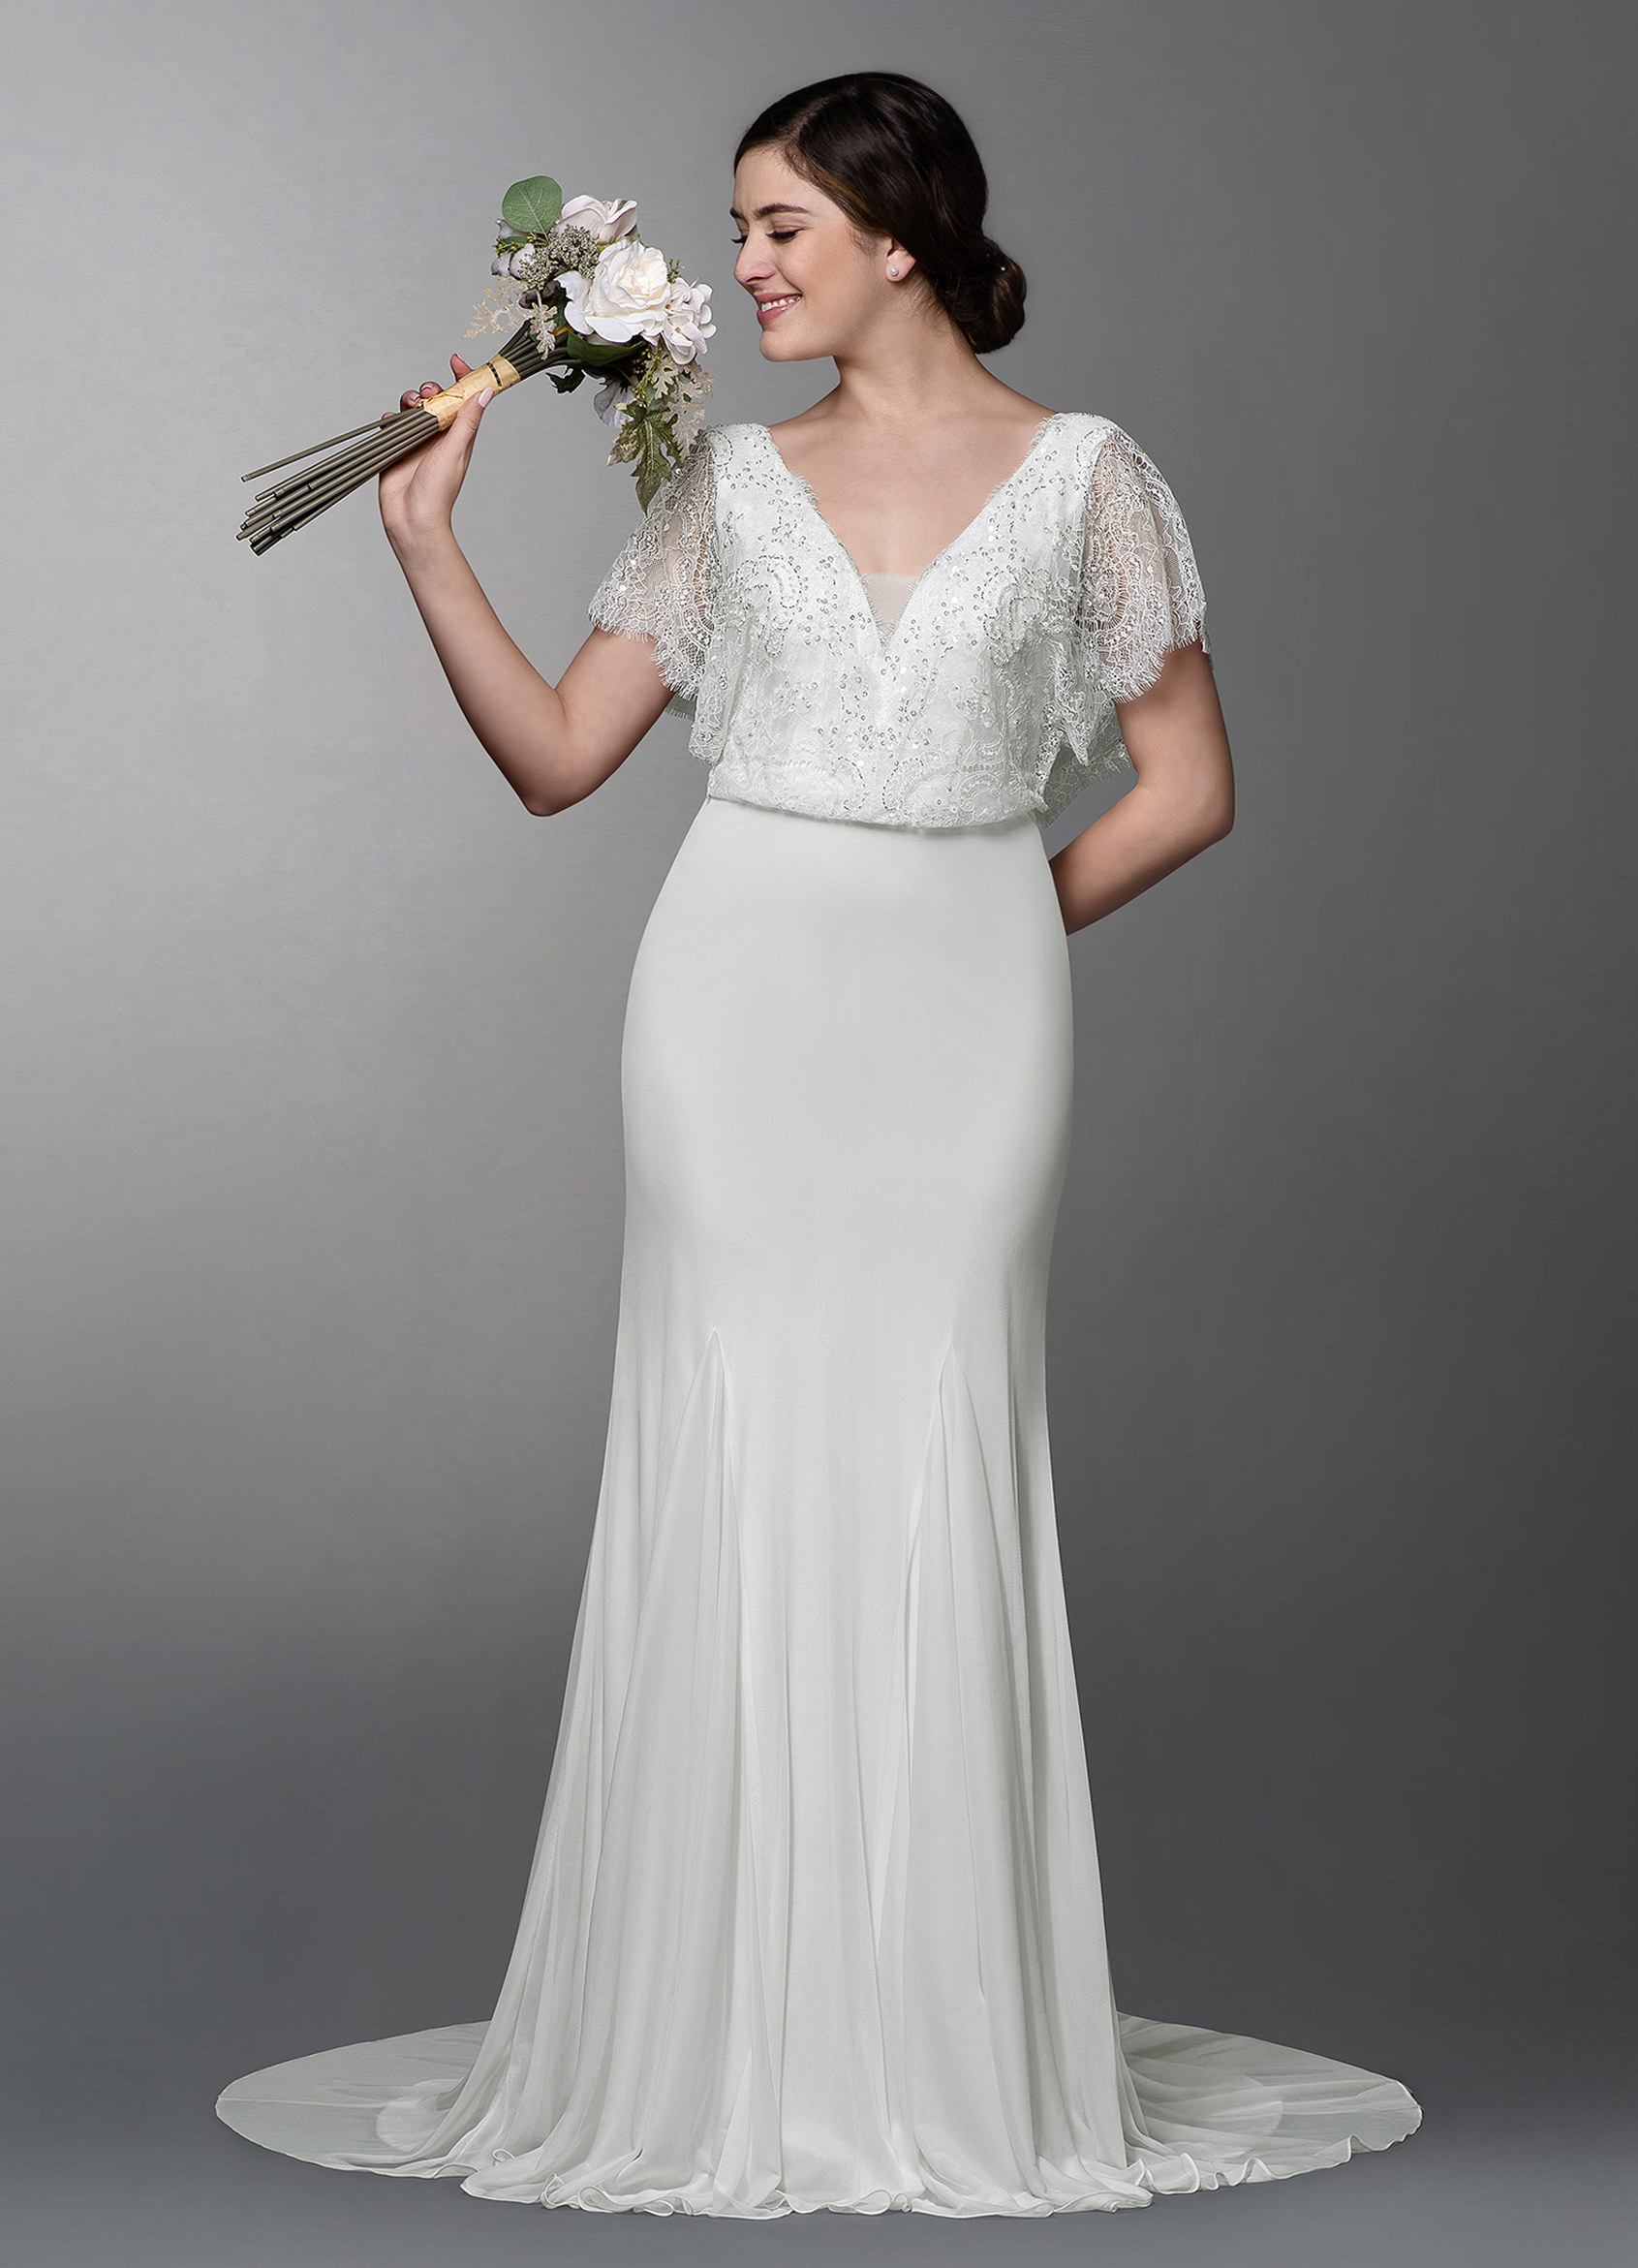 Arella Bg Sample Dress